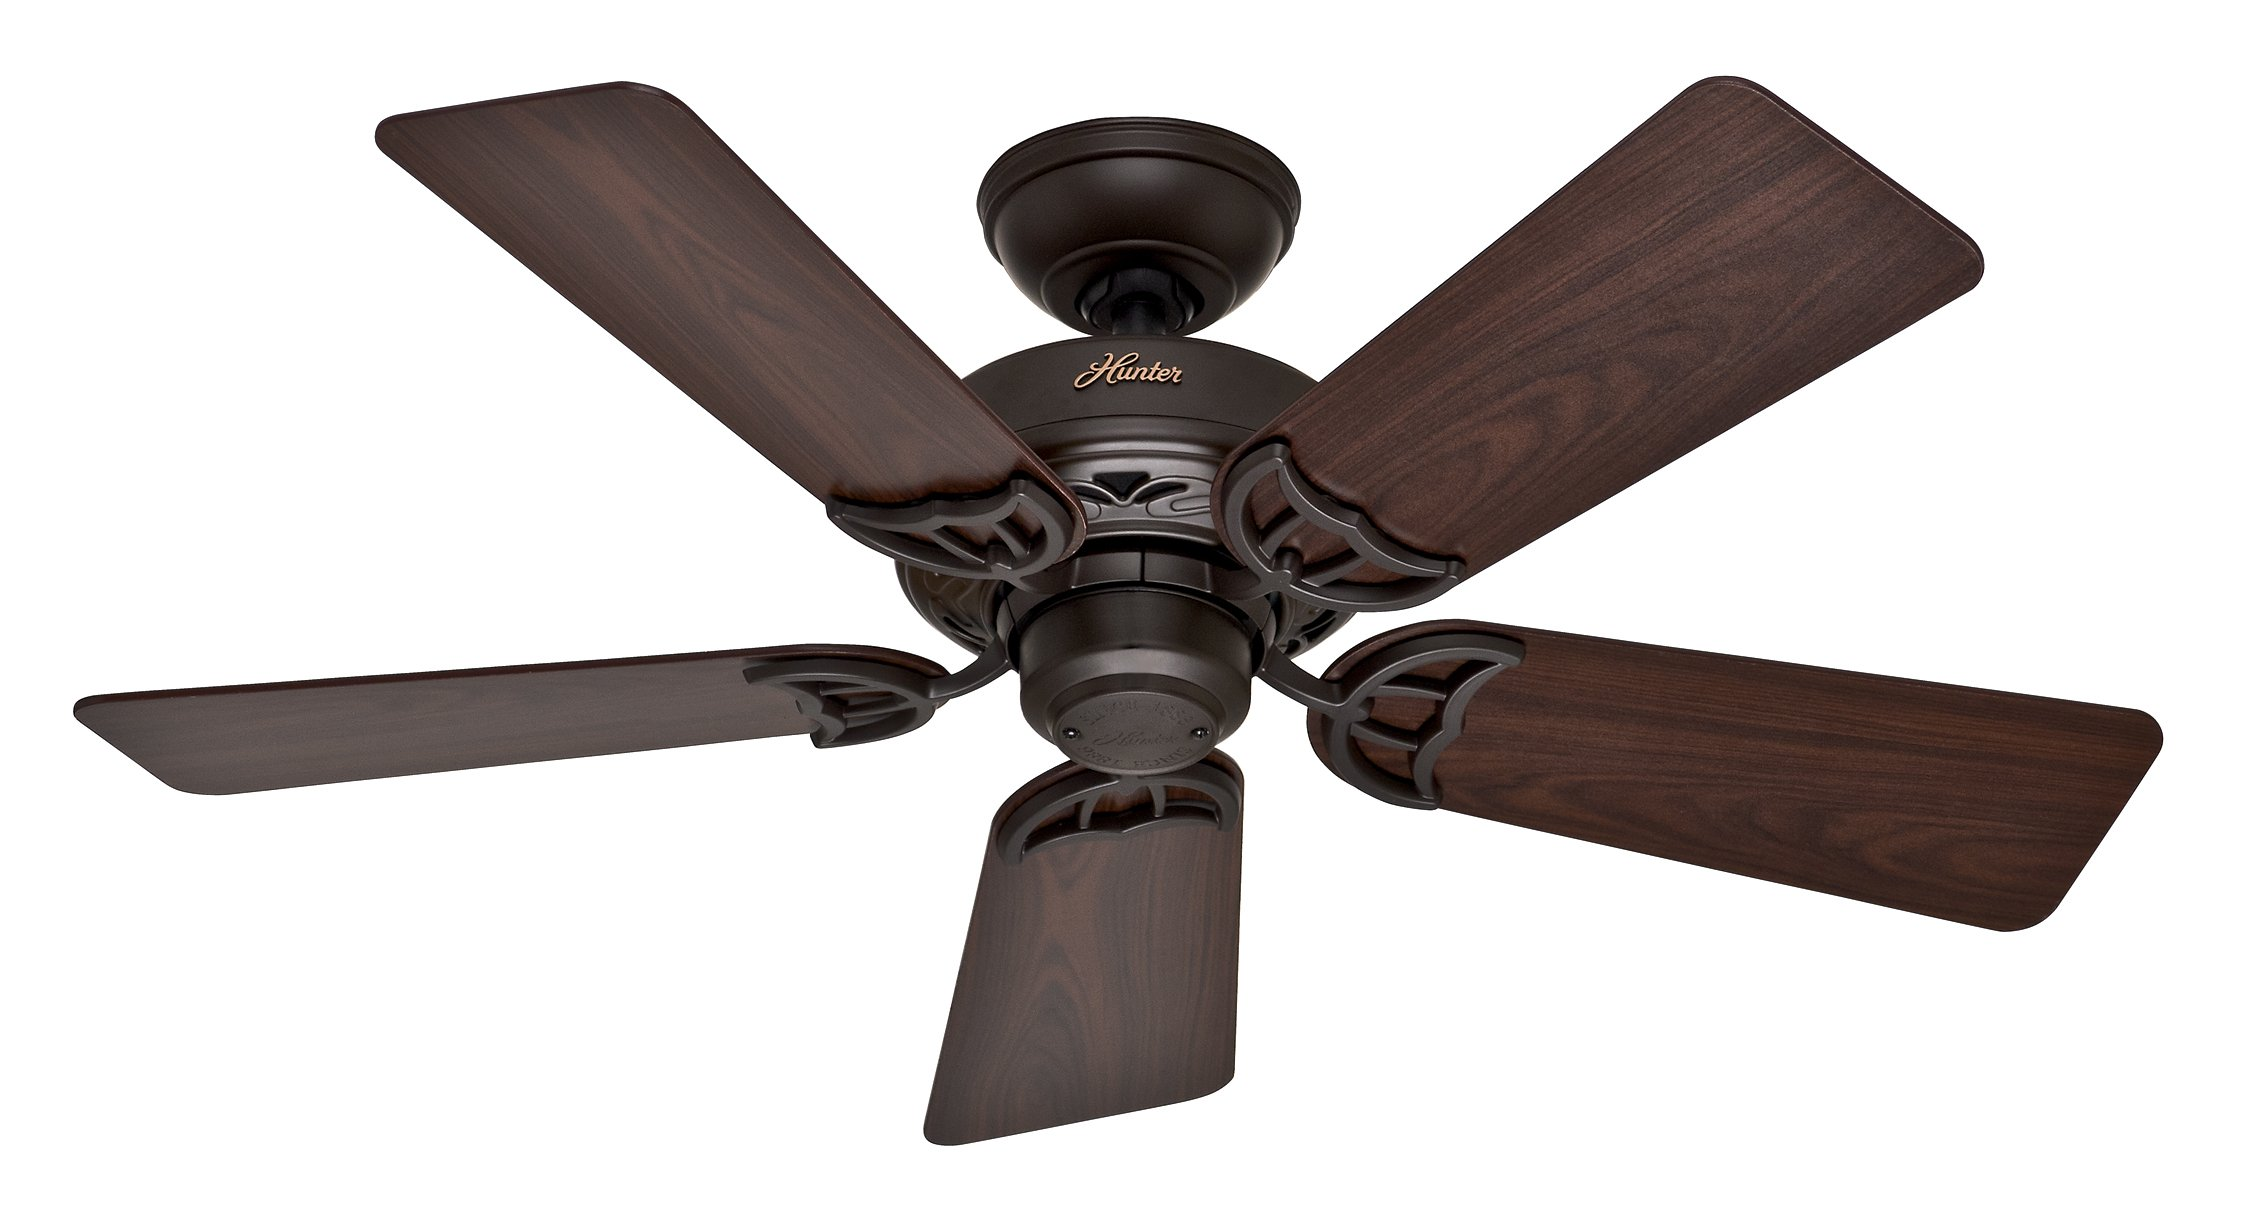 Hunter 52067 Hudson 5-Blade Ceiling Fan with Black Walnut/Medium Oak Blades, 42-Inch, New Bronze